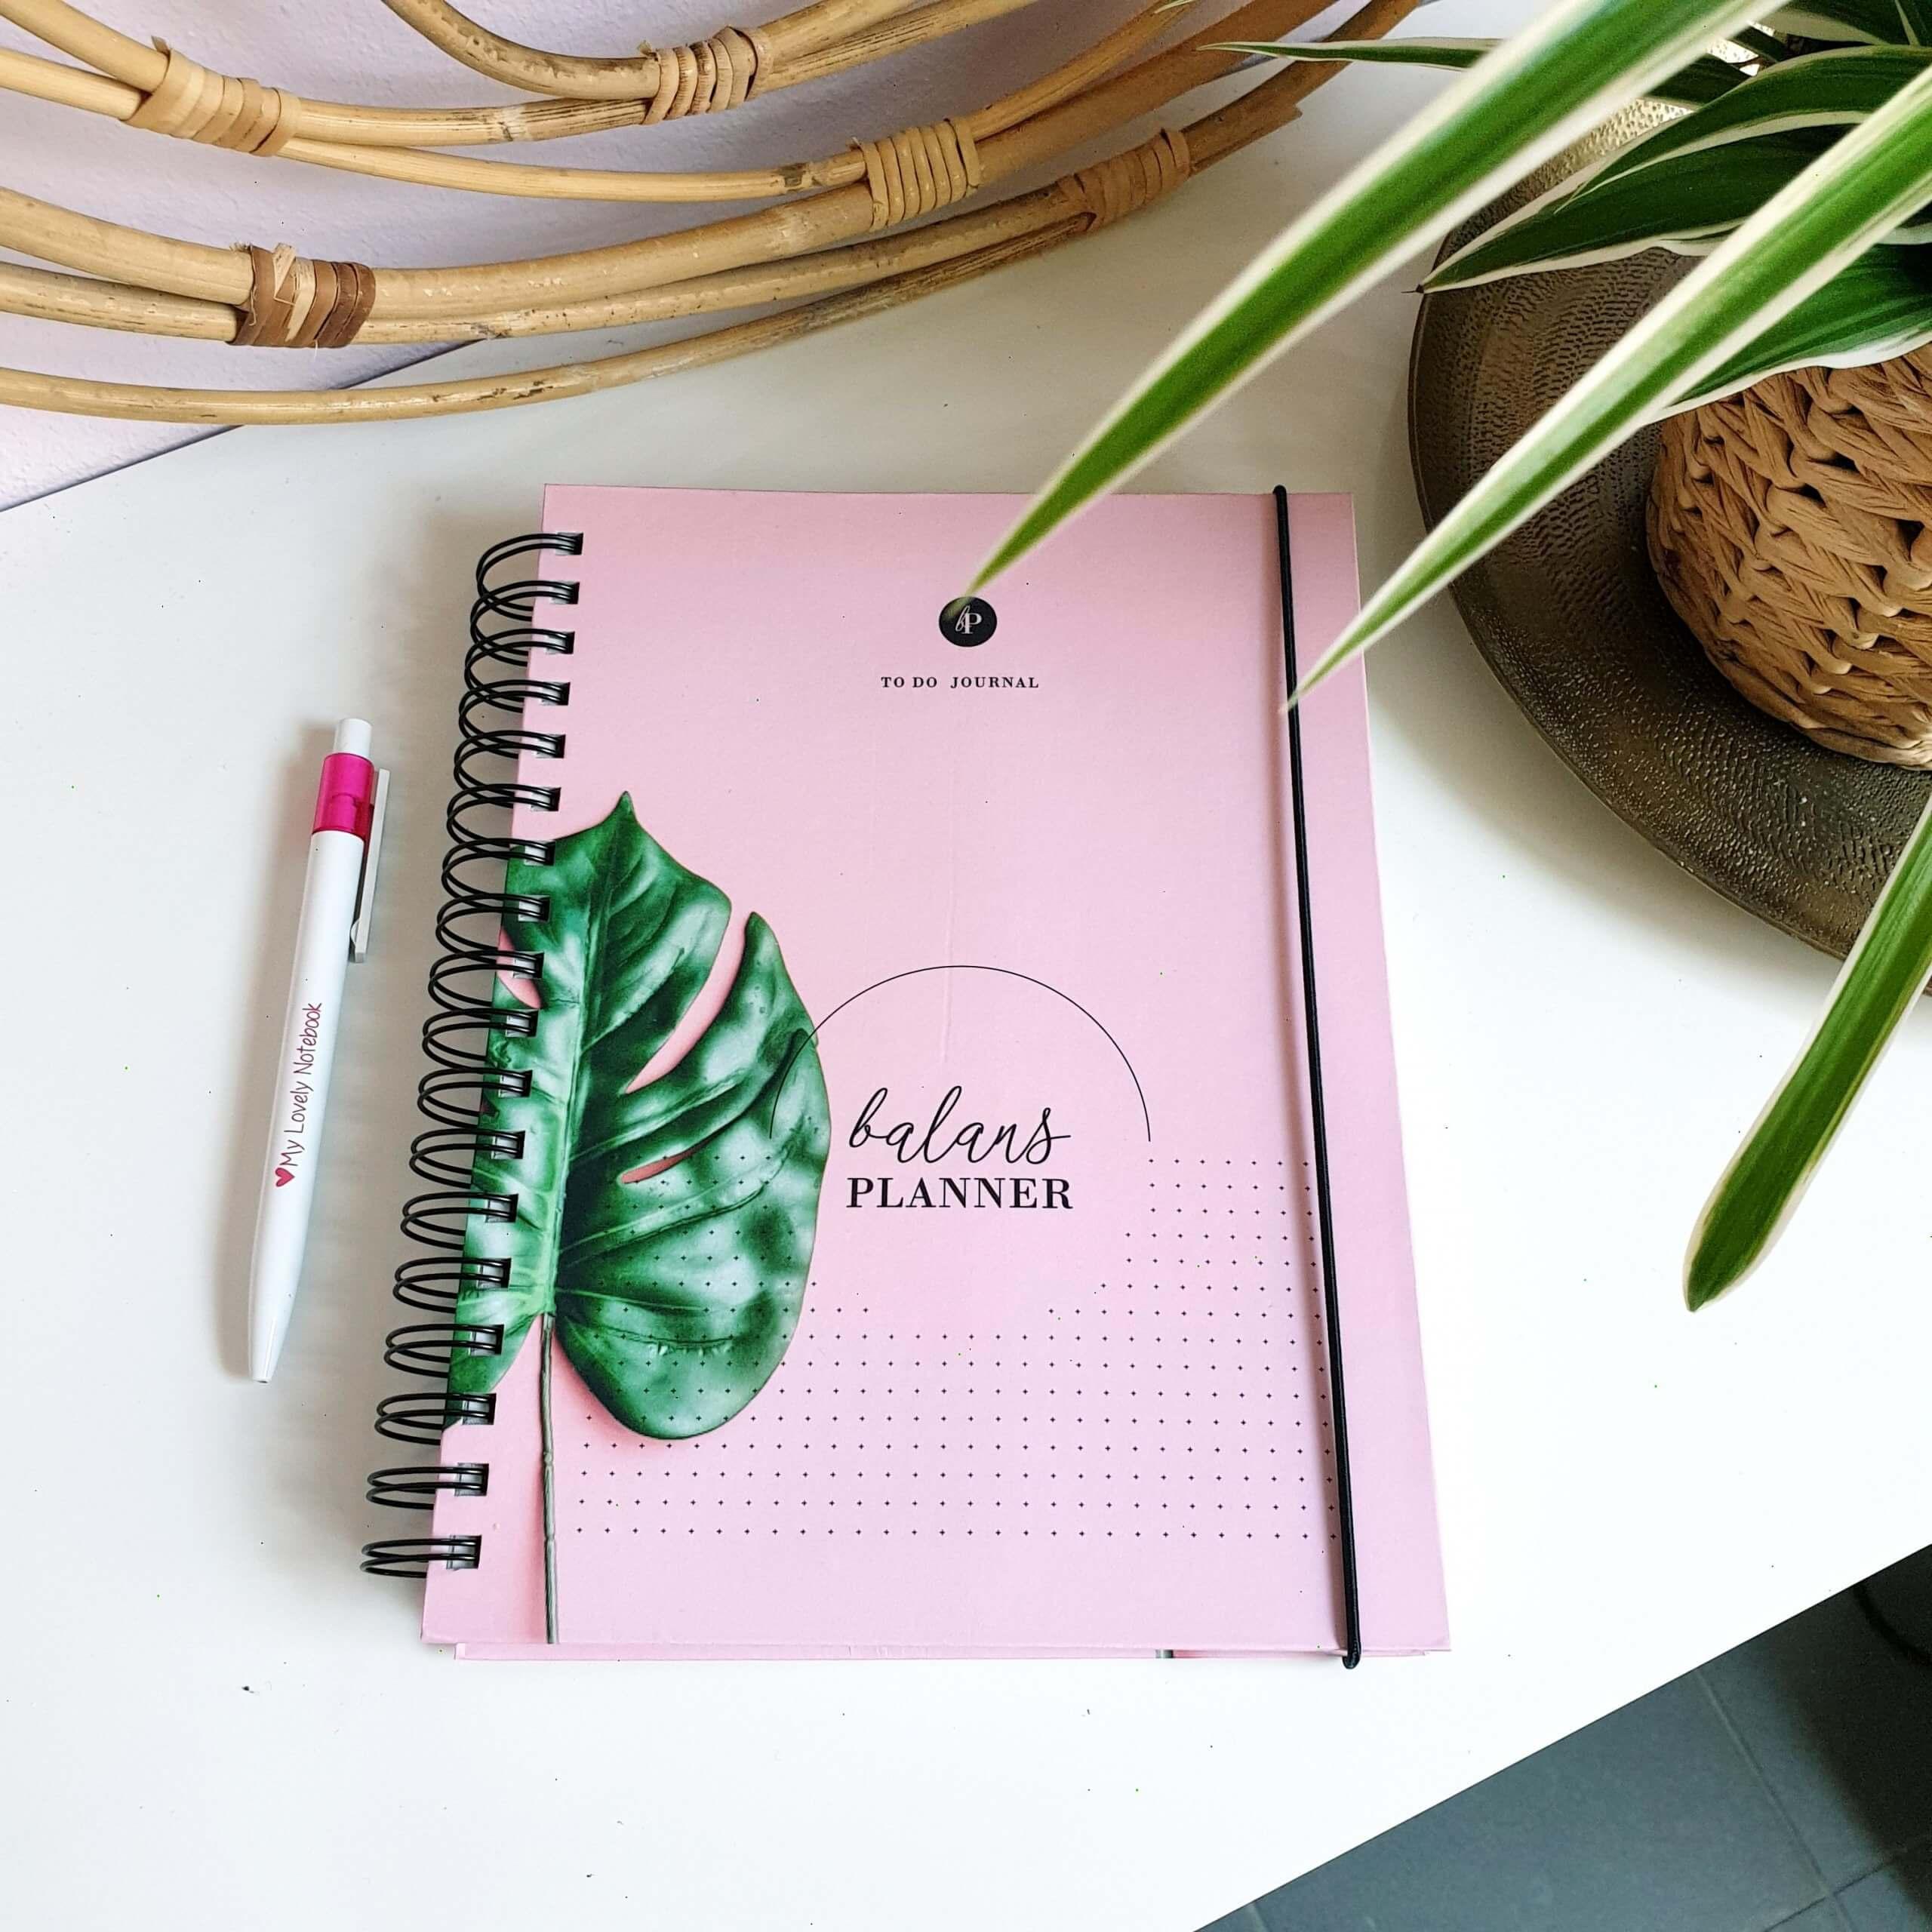 Balans Planner Pink